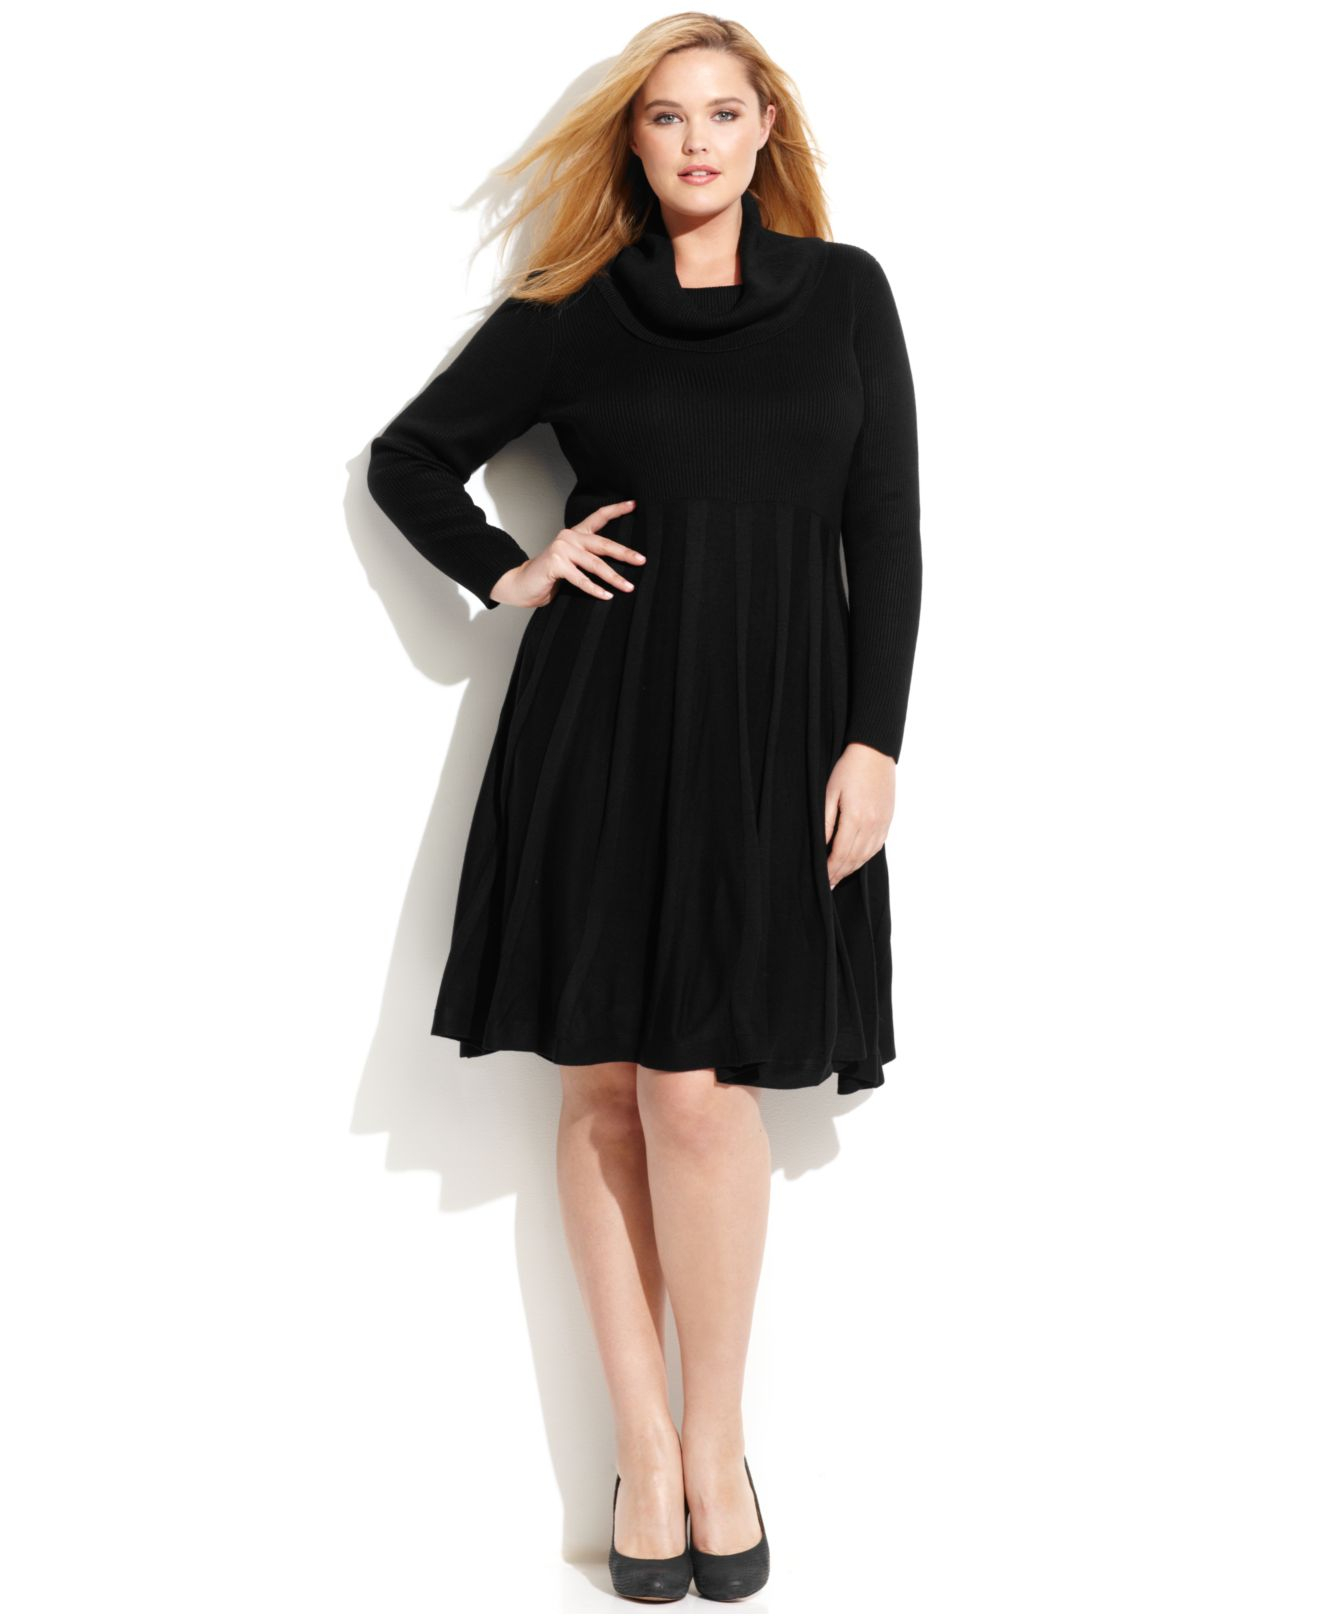 Lyst Calvin Klein Plus Size Cowl Neck Sweater Dress In Black